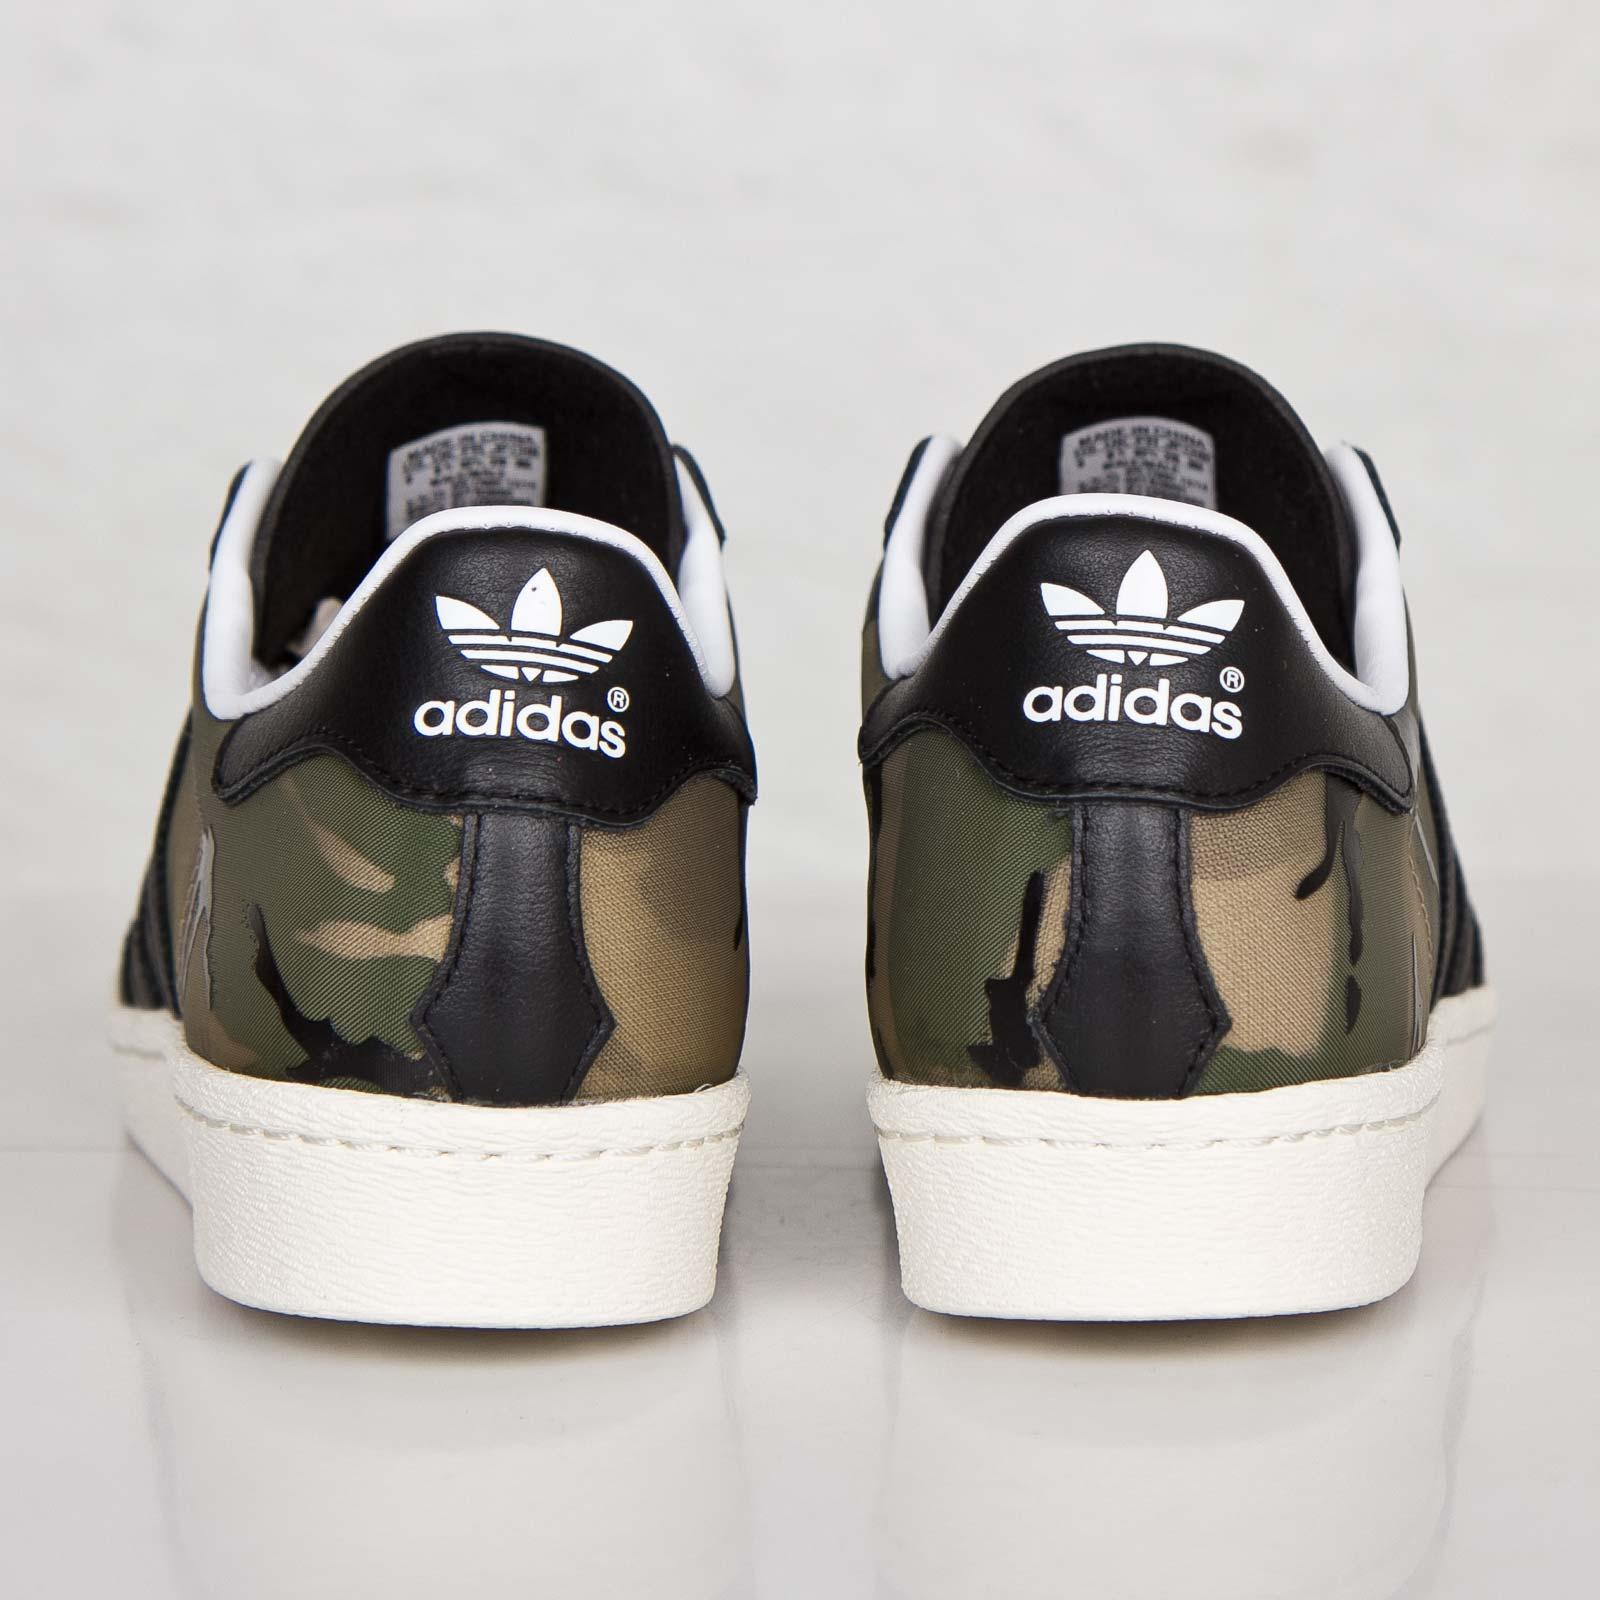 premium selection 05fc2 0366d ... adidas Clot Superstar 80s 84-Lab. ...